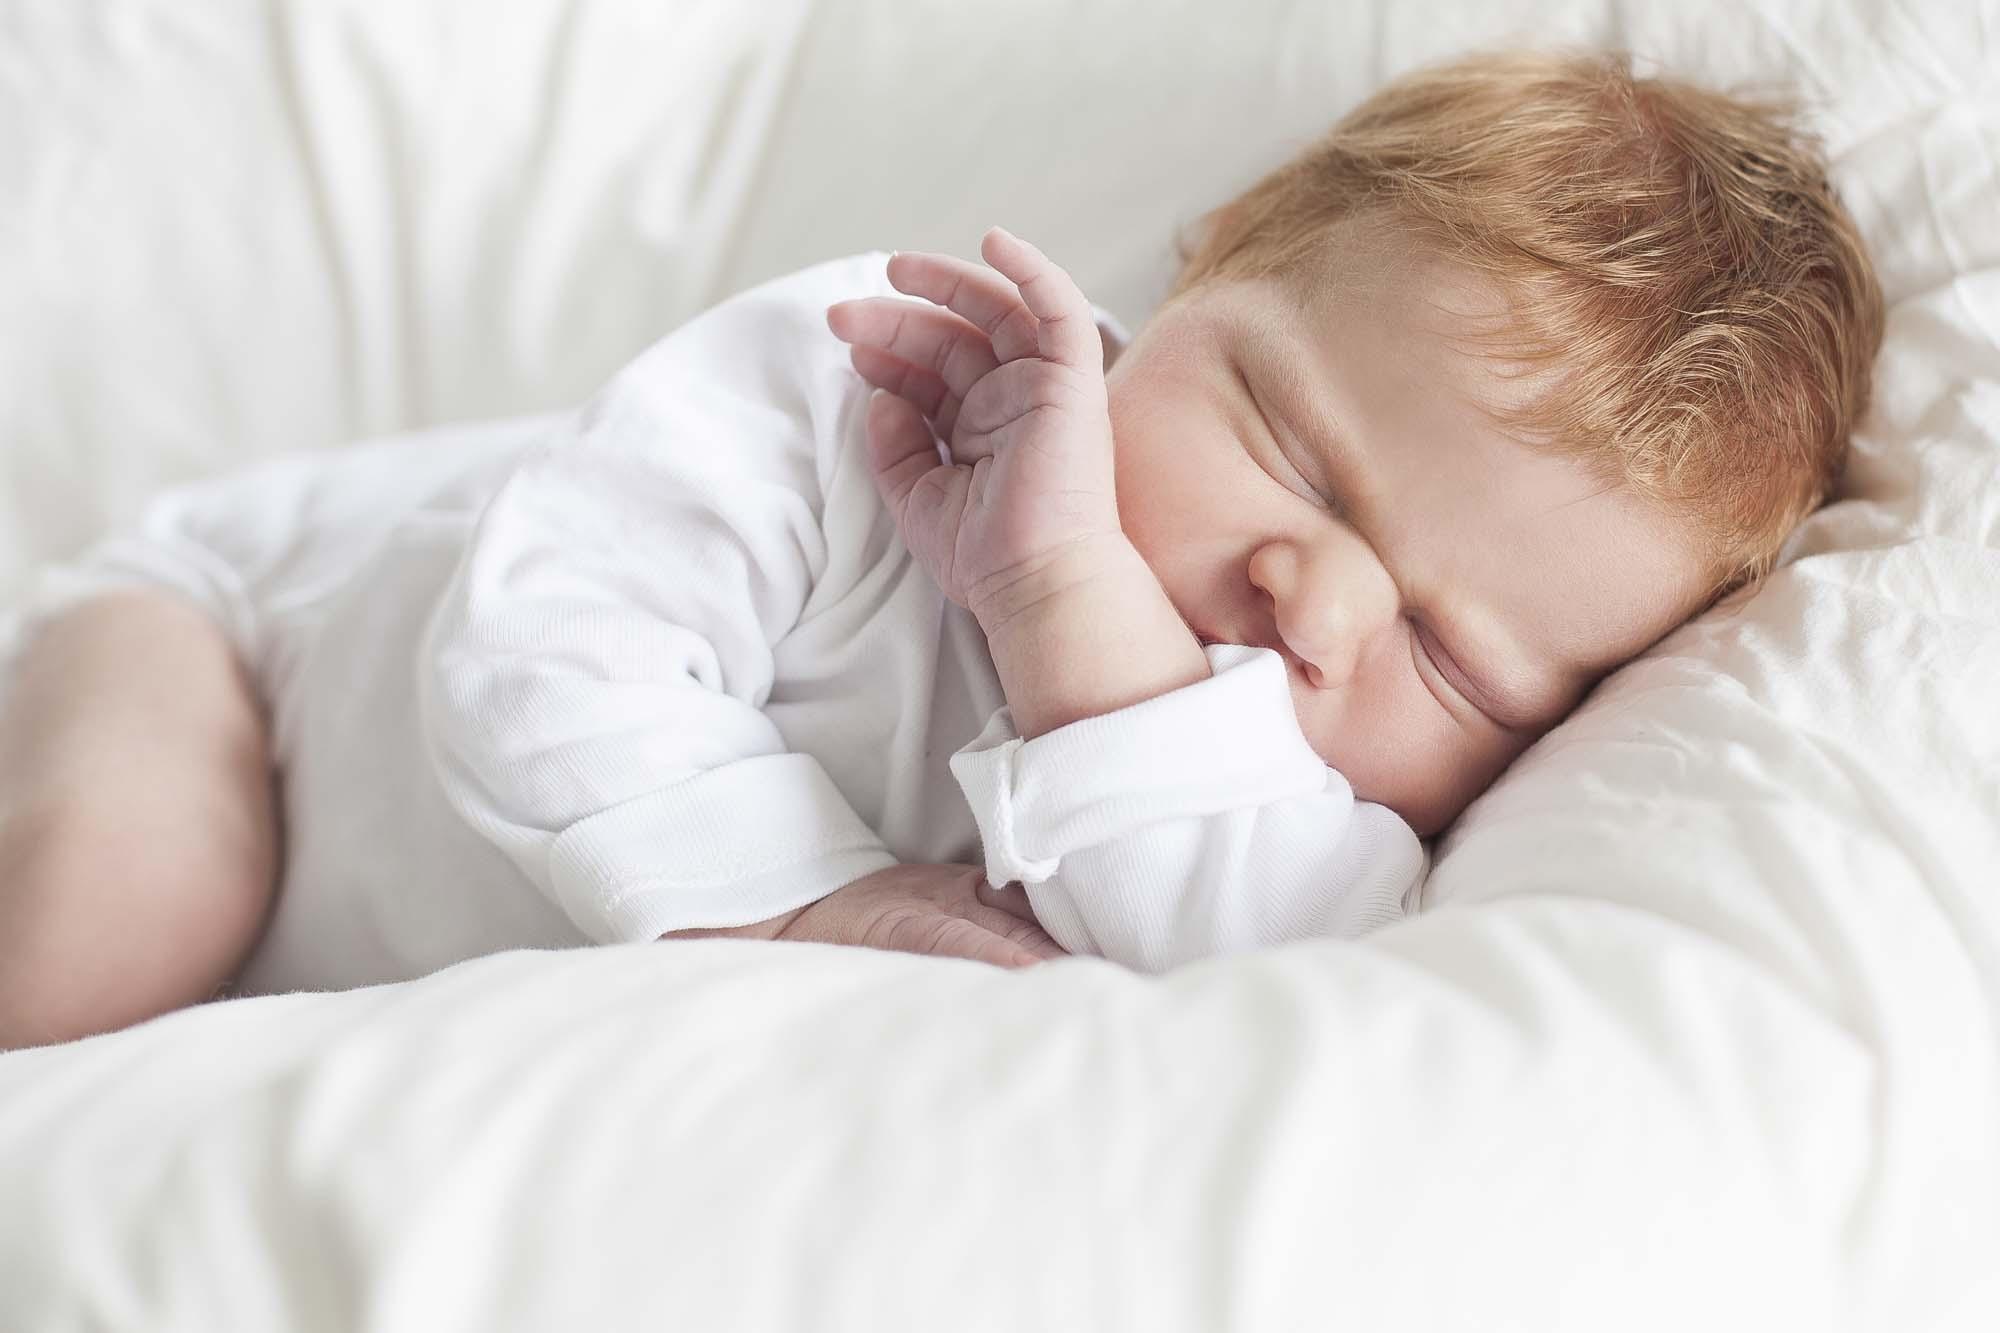 Fotograf Köpenick Neugeborenenreportage von Ella